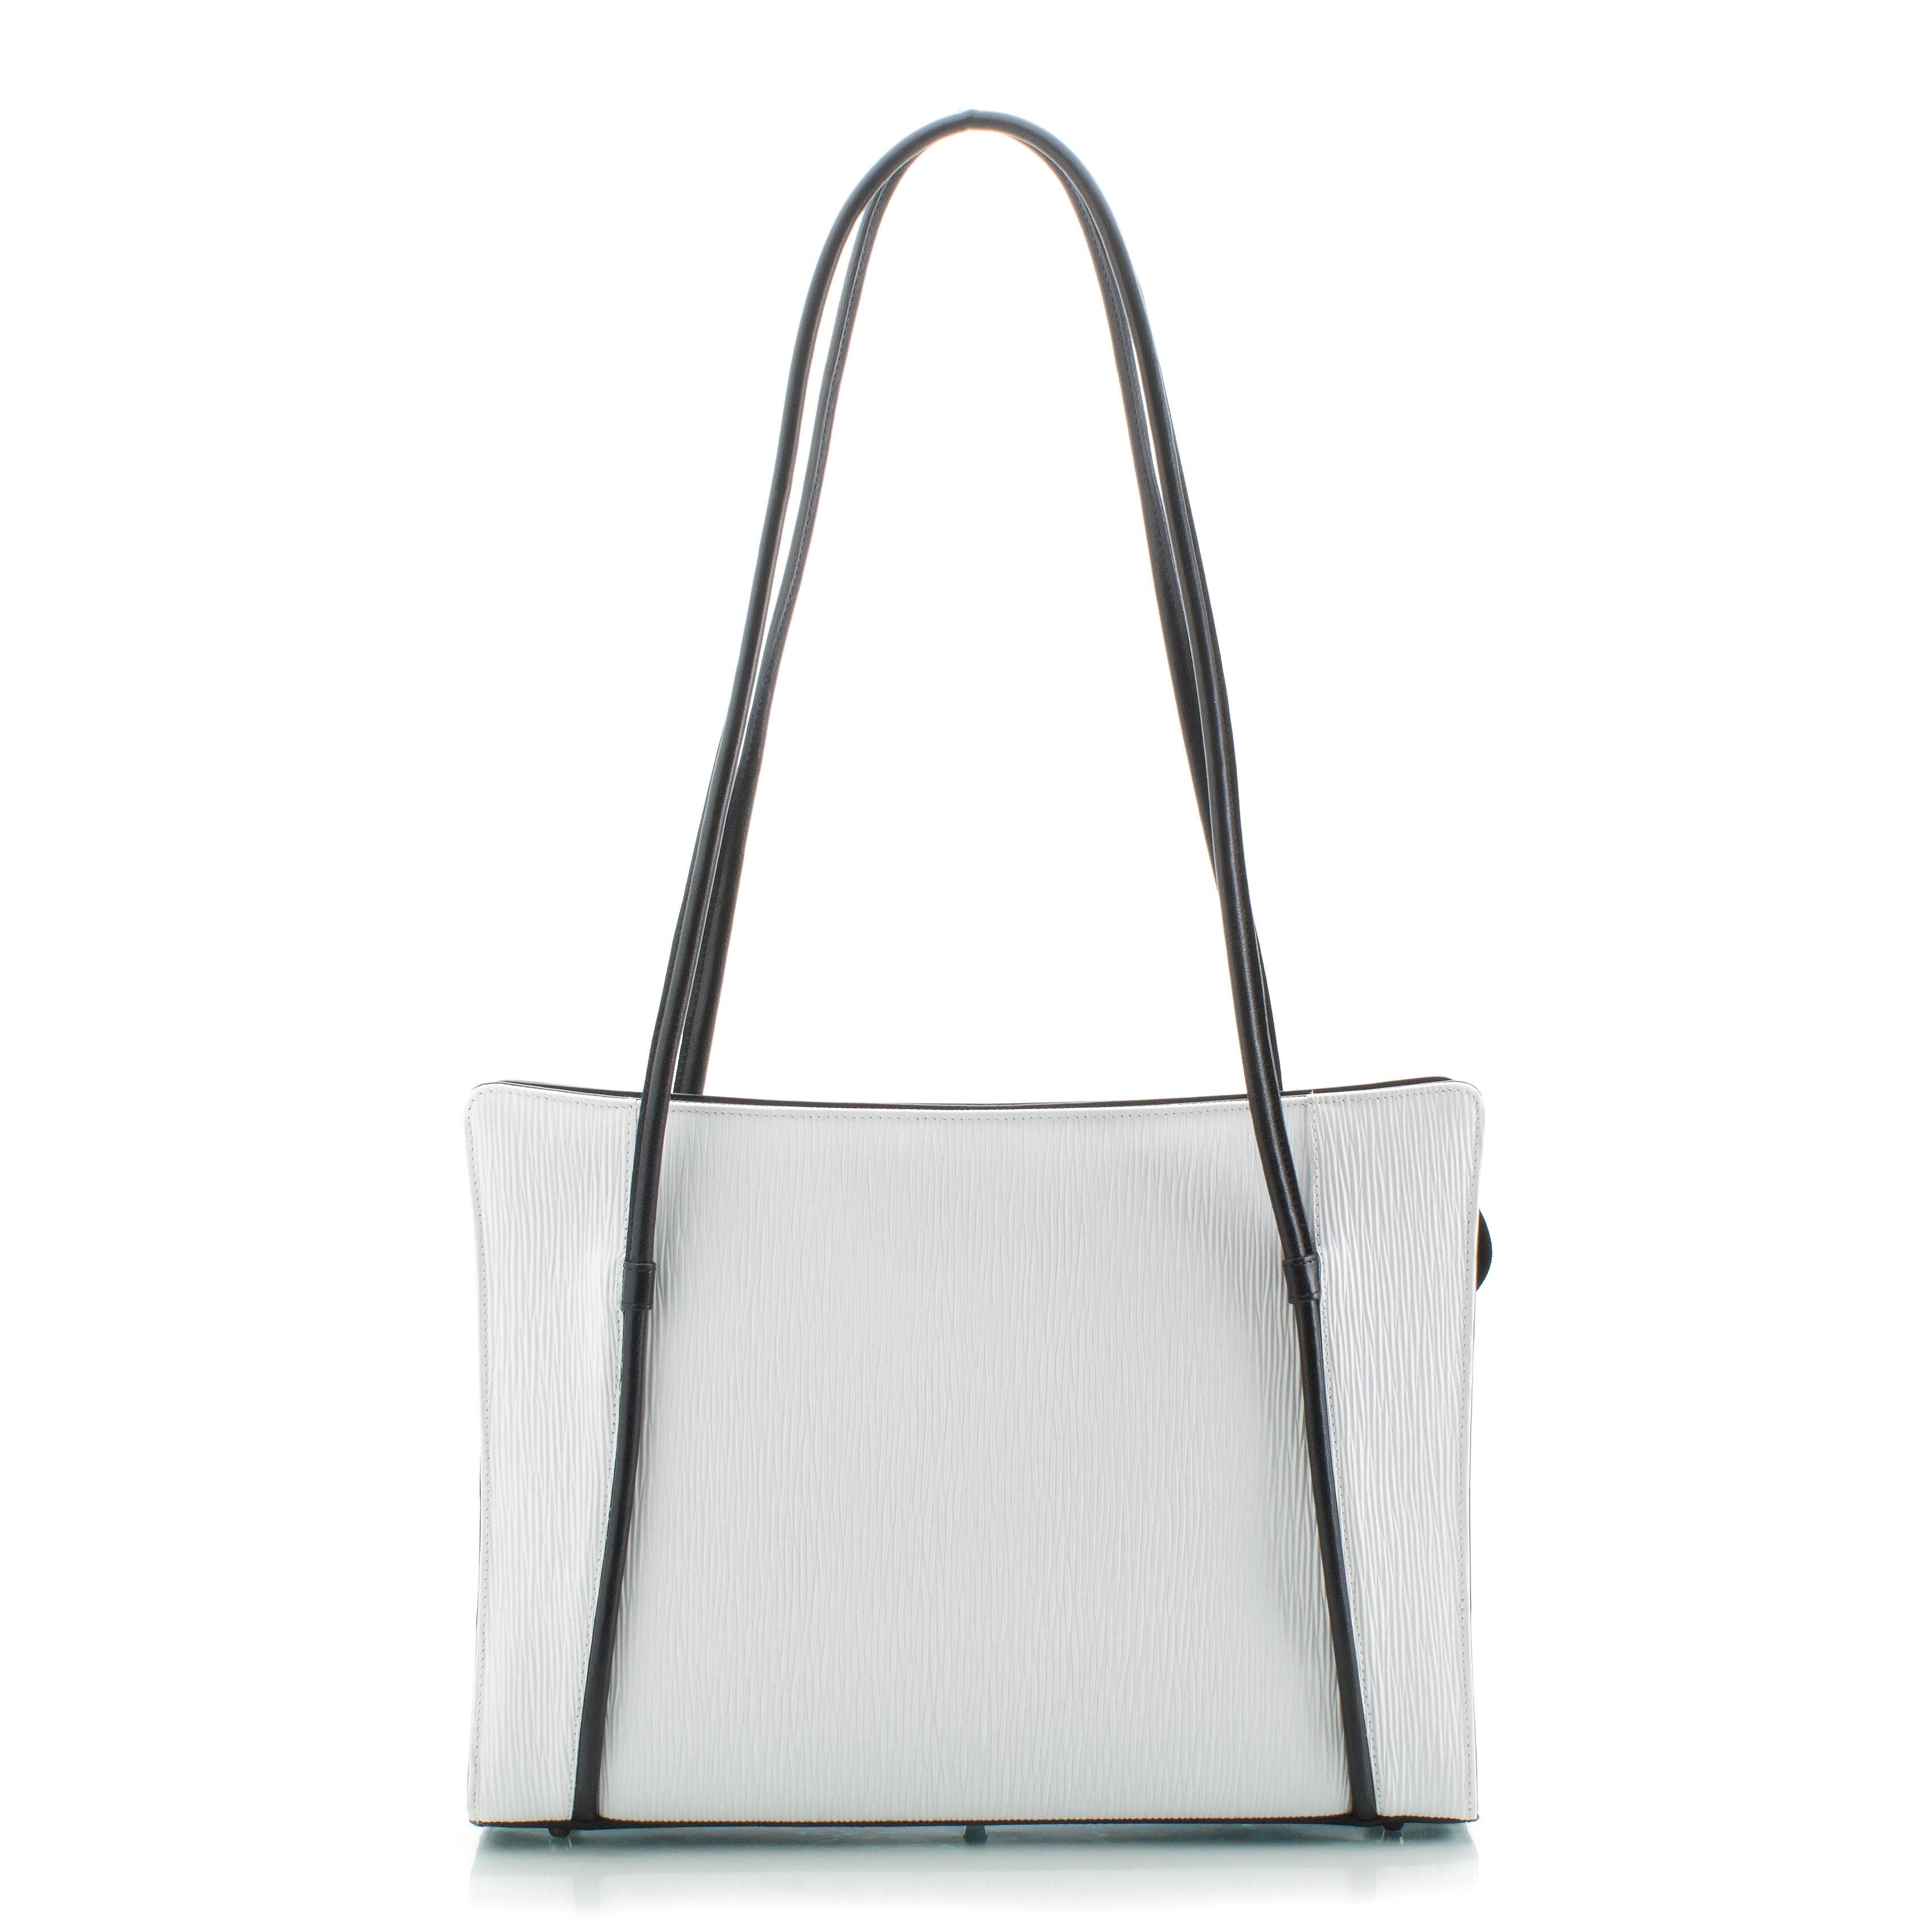 Business kabelka ADK Madeira XL (kol. Rondo) bílá/černá